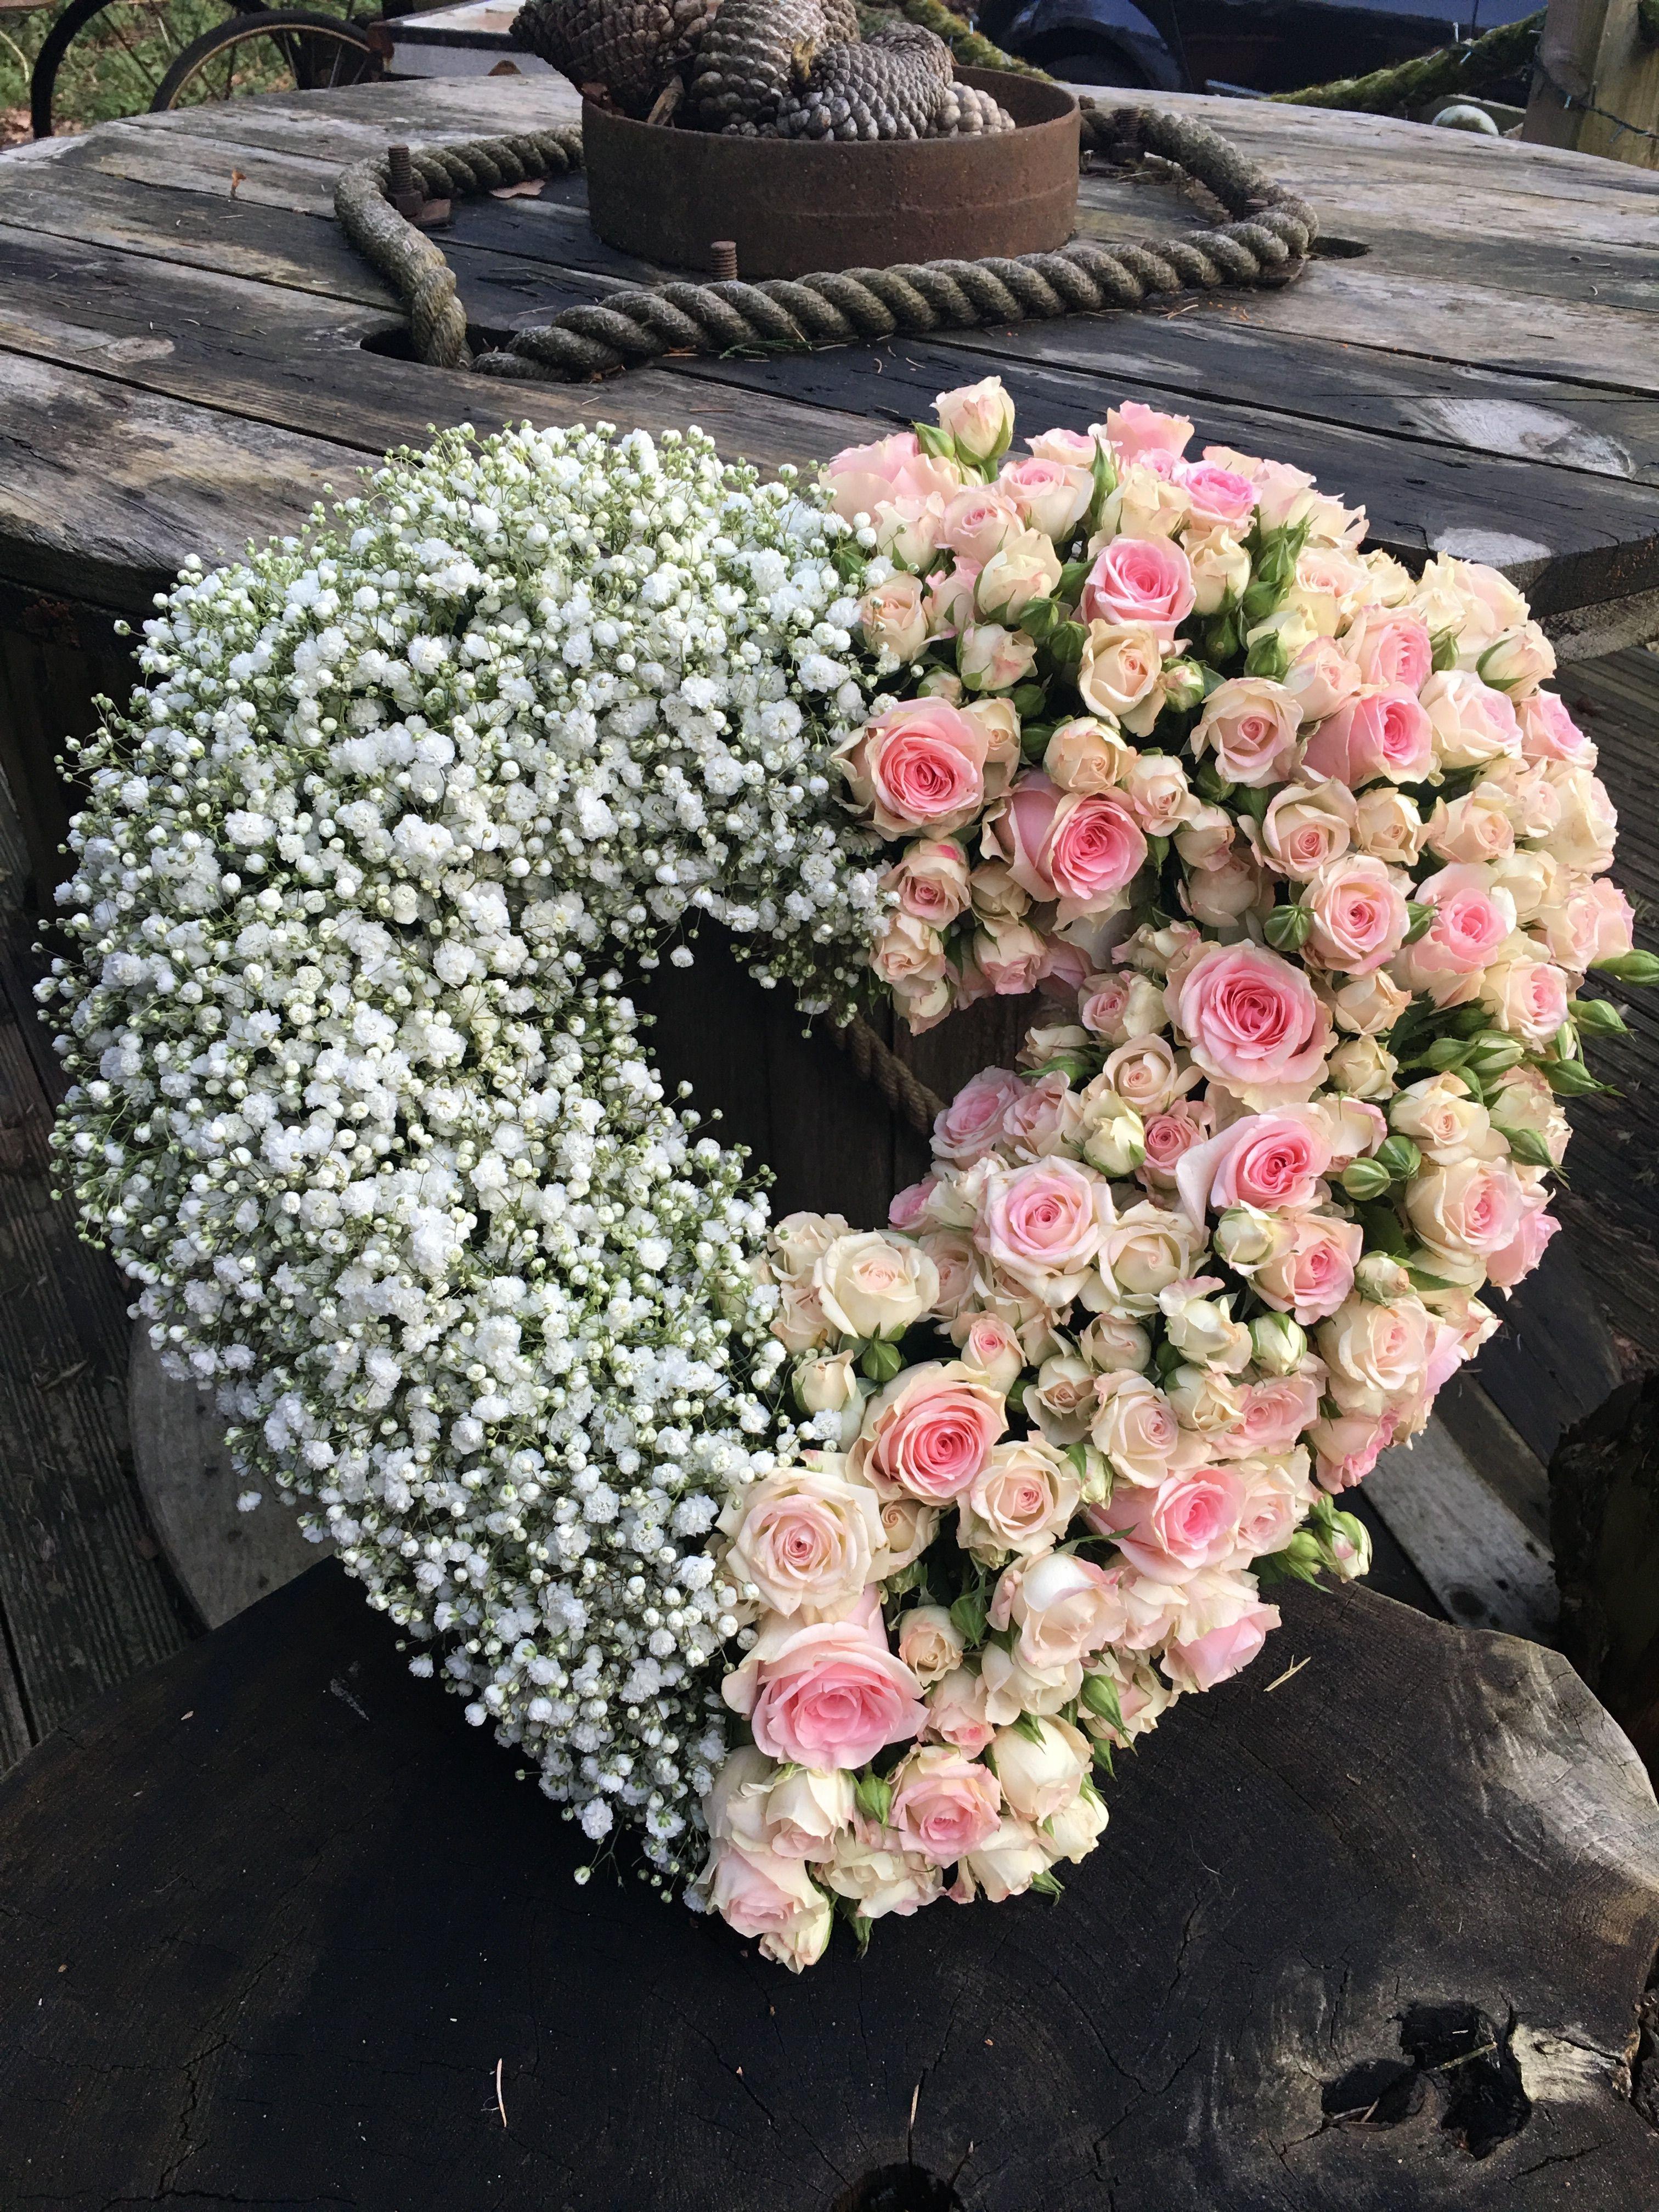 Pretty rose heart flower tribute bespoke funeral flowers www pretty rose heart flower tribute bespoke funeral flowers thefloralartstudio izmirmasajfo